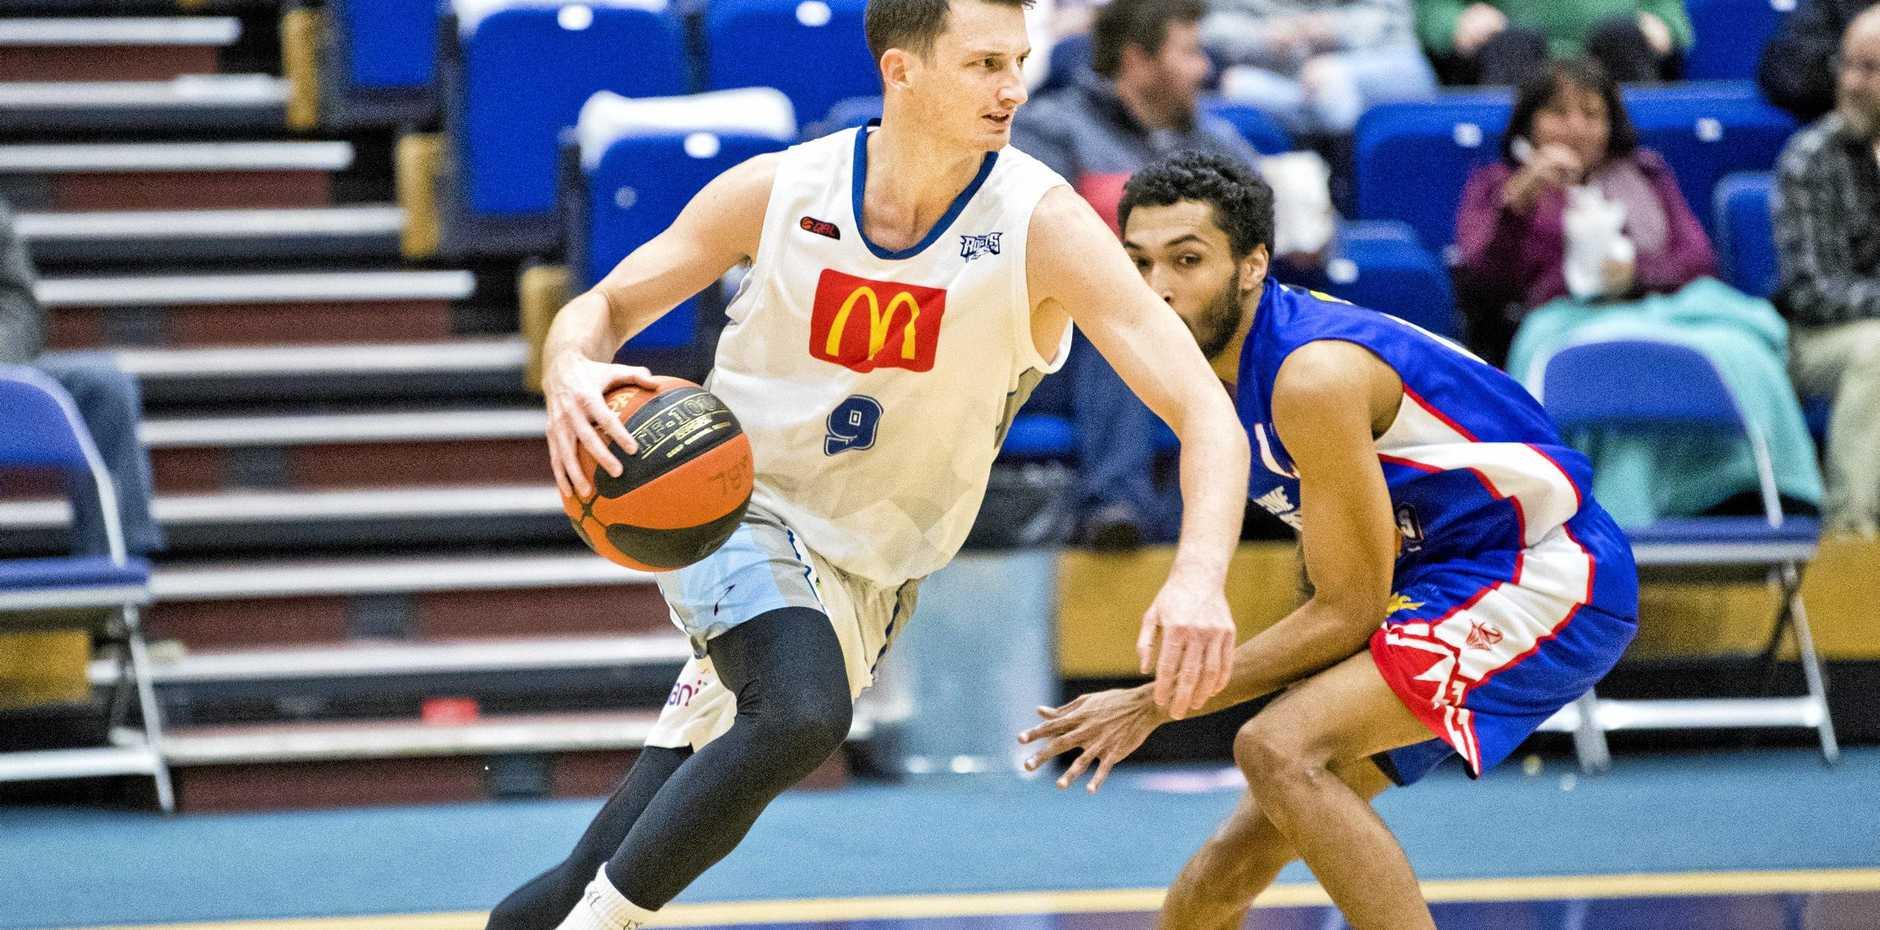 Shaun Bruce, Rockets. QBL, Toowoomba Mountaineers vs Rockhampton Rockets. Saturday, 6th Jul, 2019.